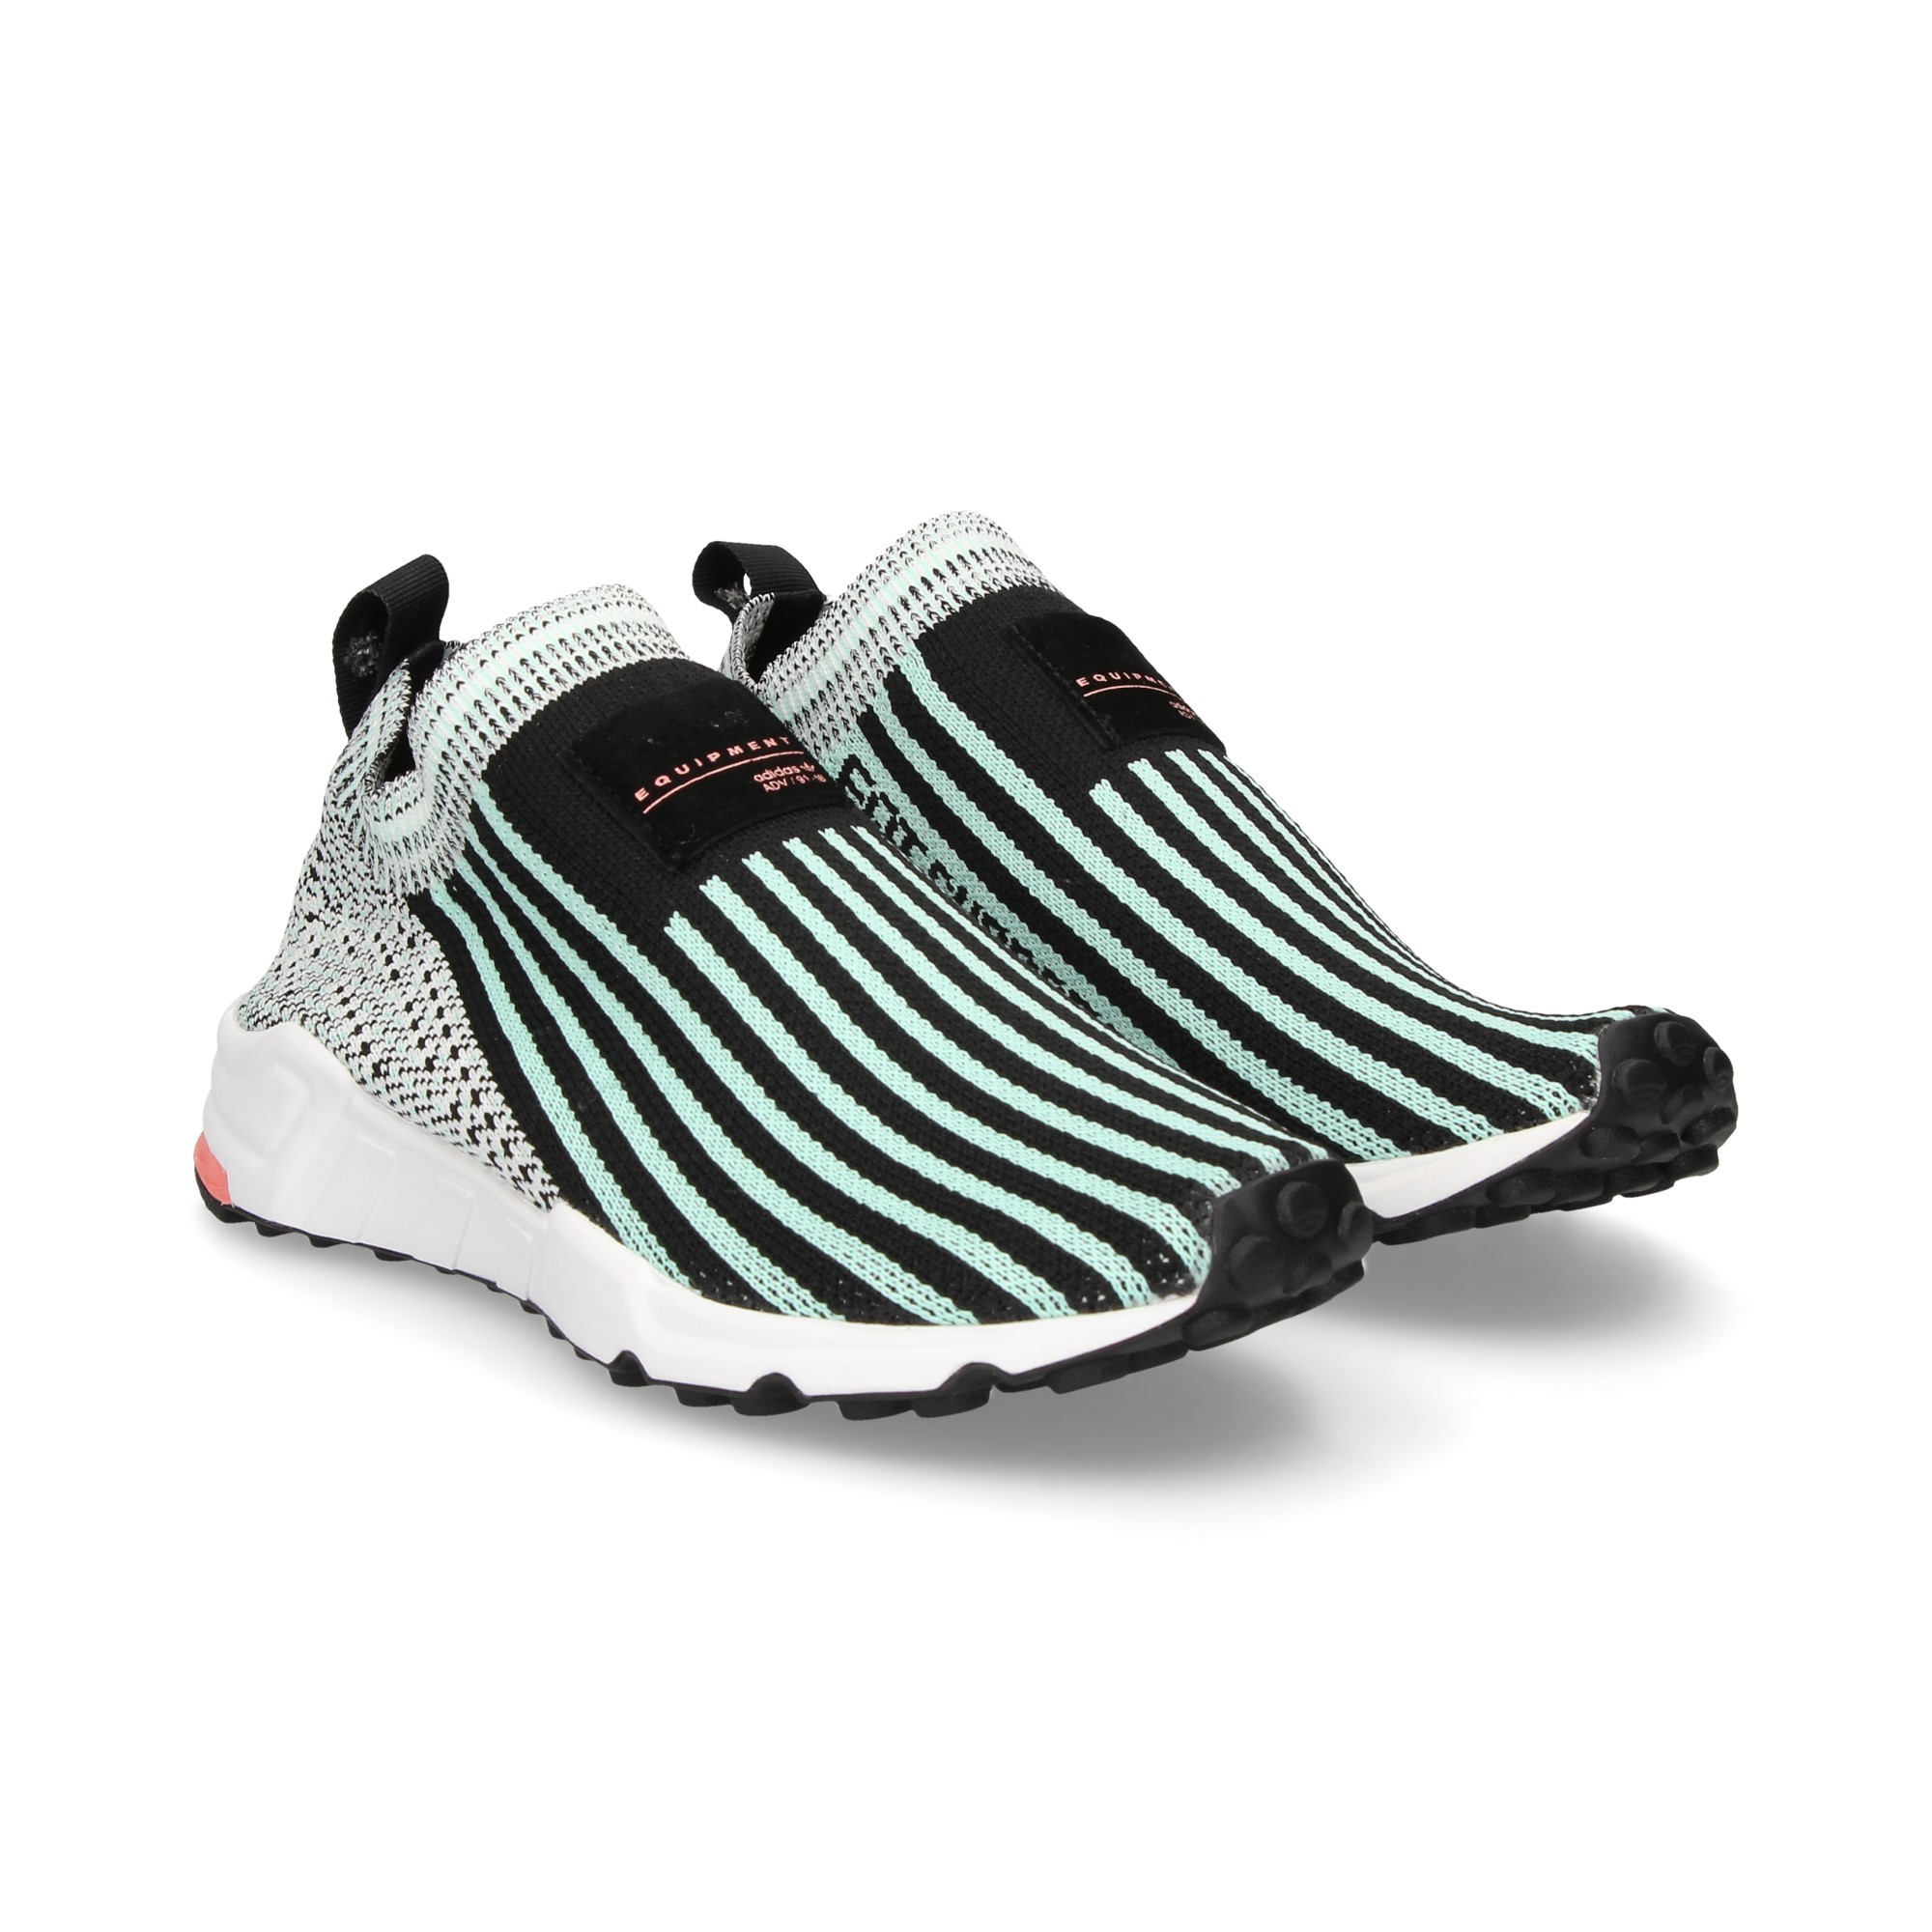 Adidas Zapatillas De Mujer Eqt Cblackcleminf TFKJl1c